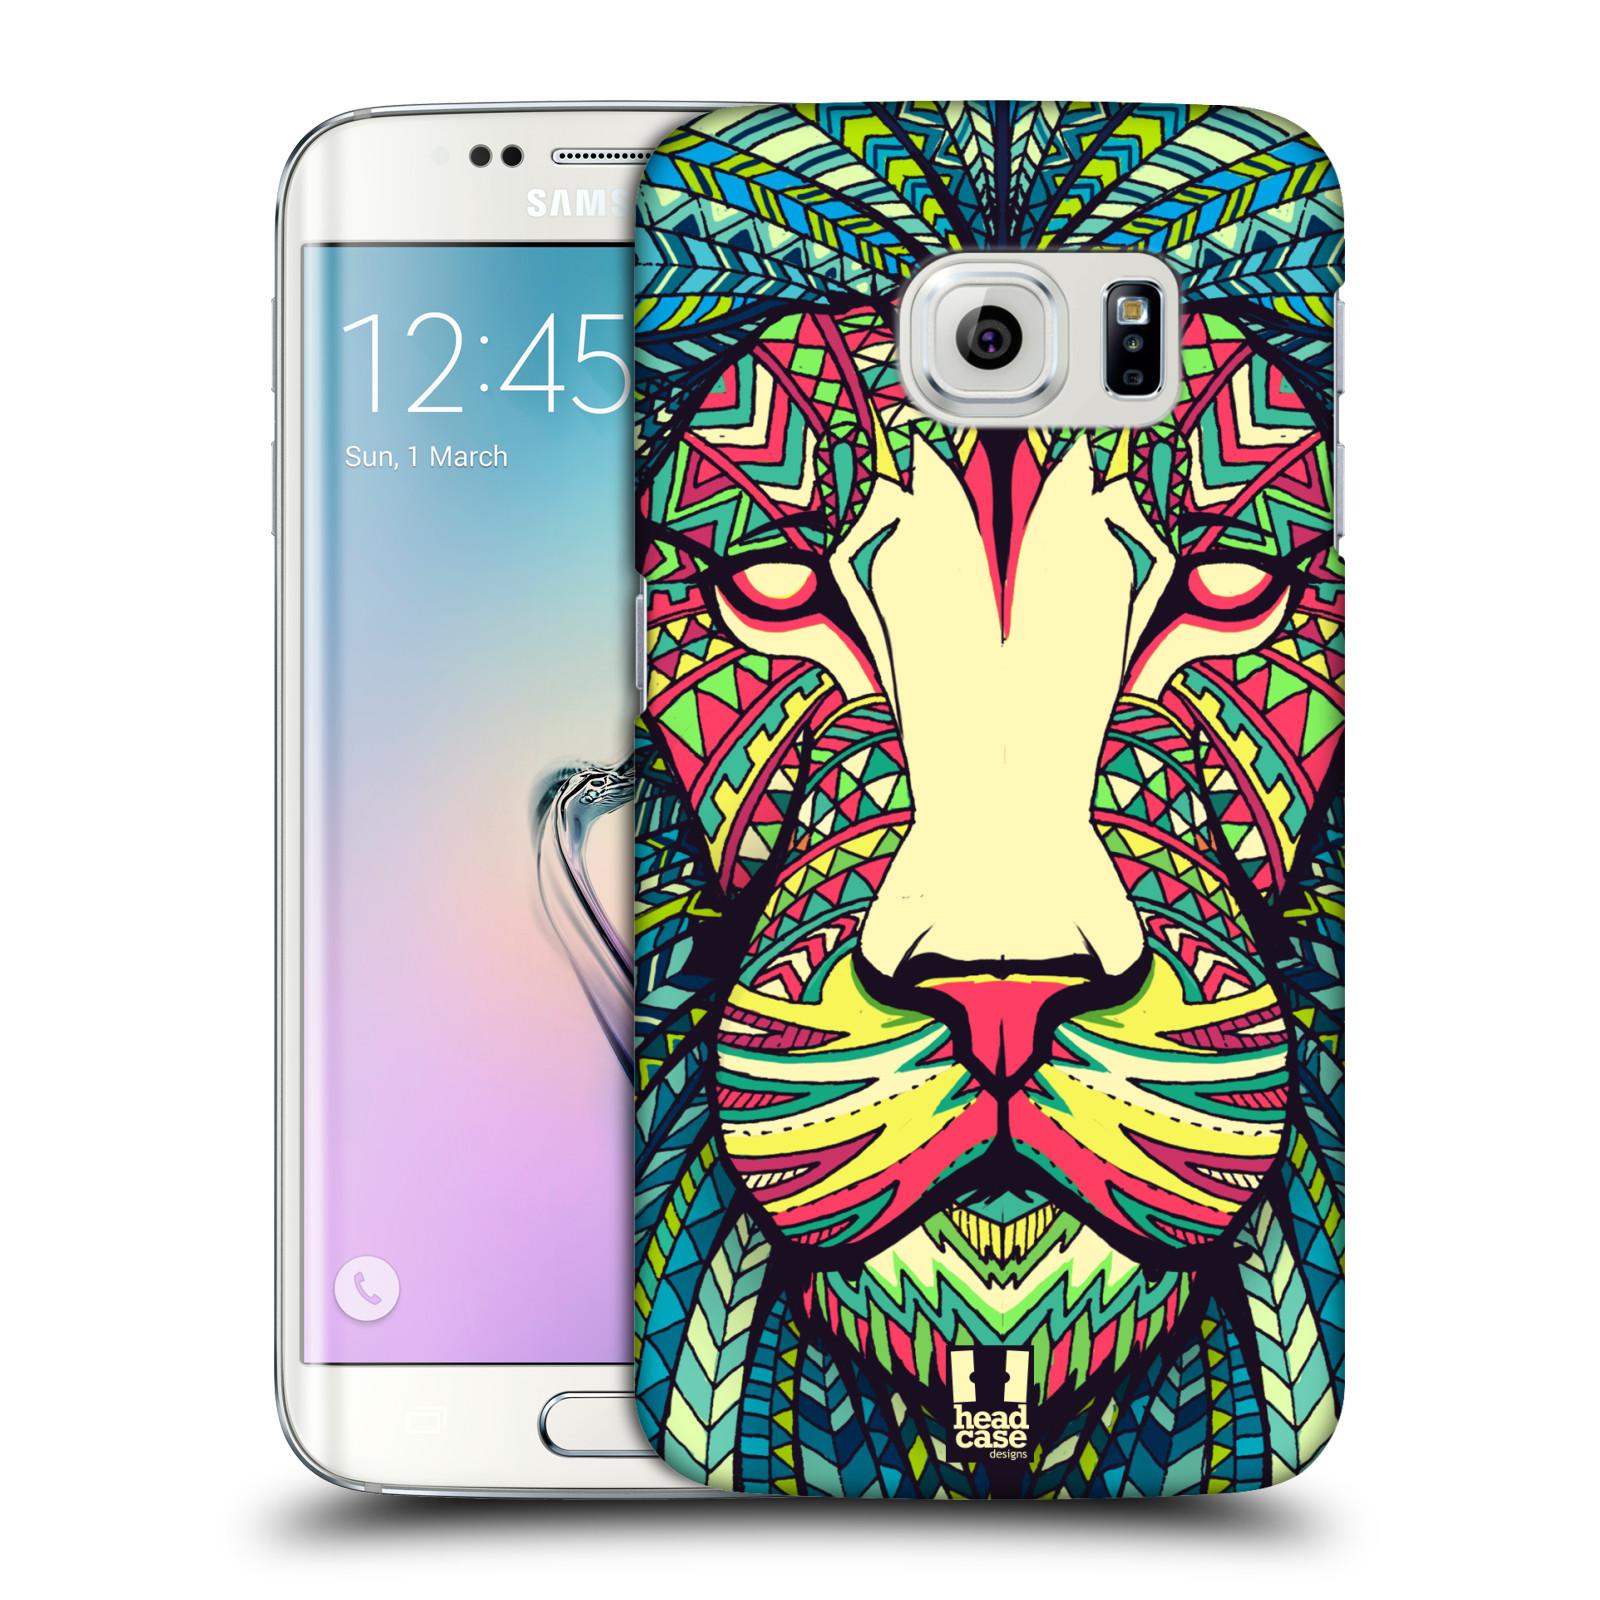 HEAD CASE plastový obal na mobil SAMSUNG Galaxy S6 EDGE (G9250, G925, G925F) vzor Aztécký motiv zvíře lev